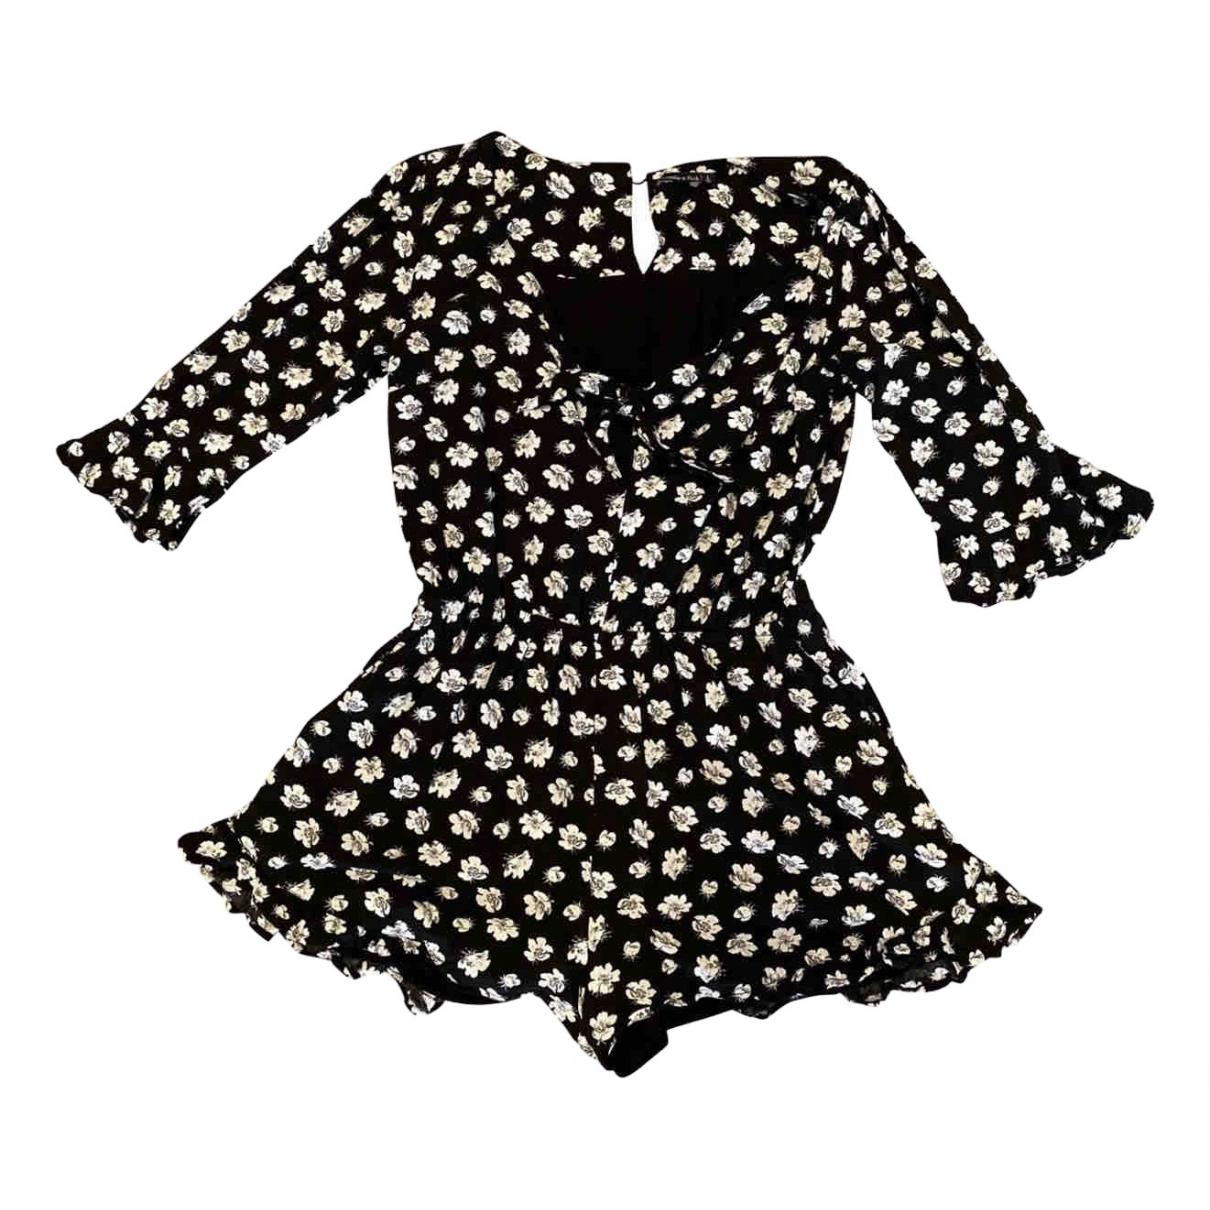 Abercrombie & Fitch \N Black jumpsuit for Women L International